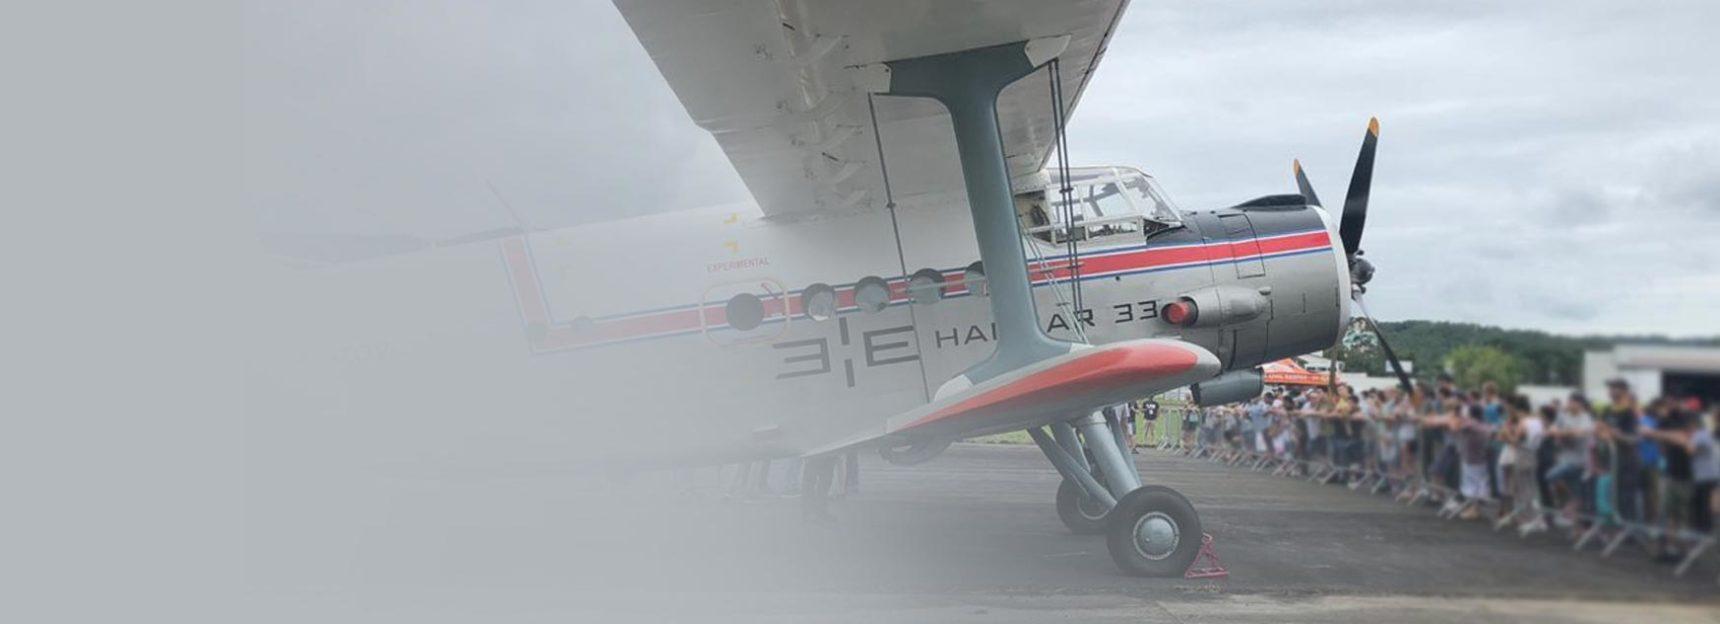 78º Aniversário do > Aeroclube de Blumenau